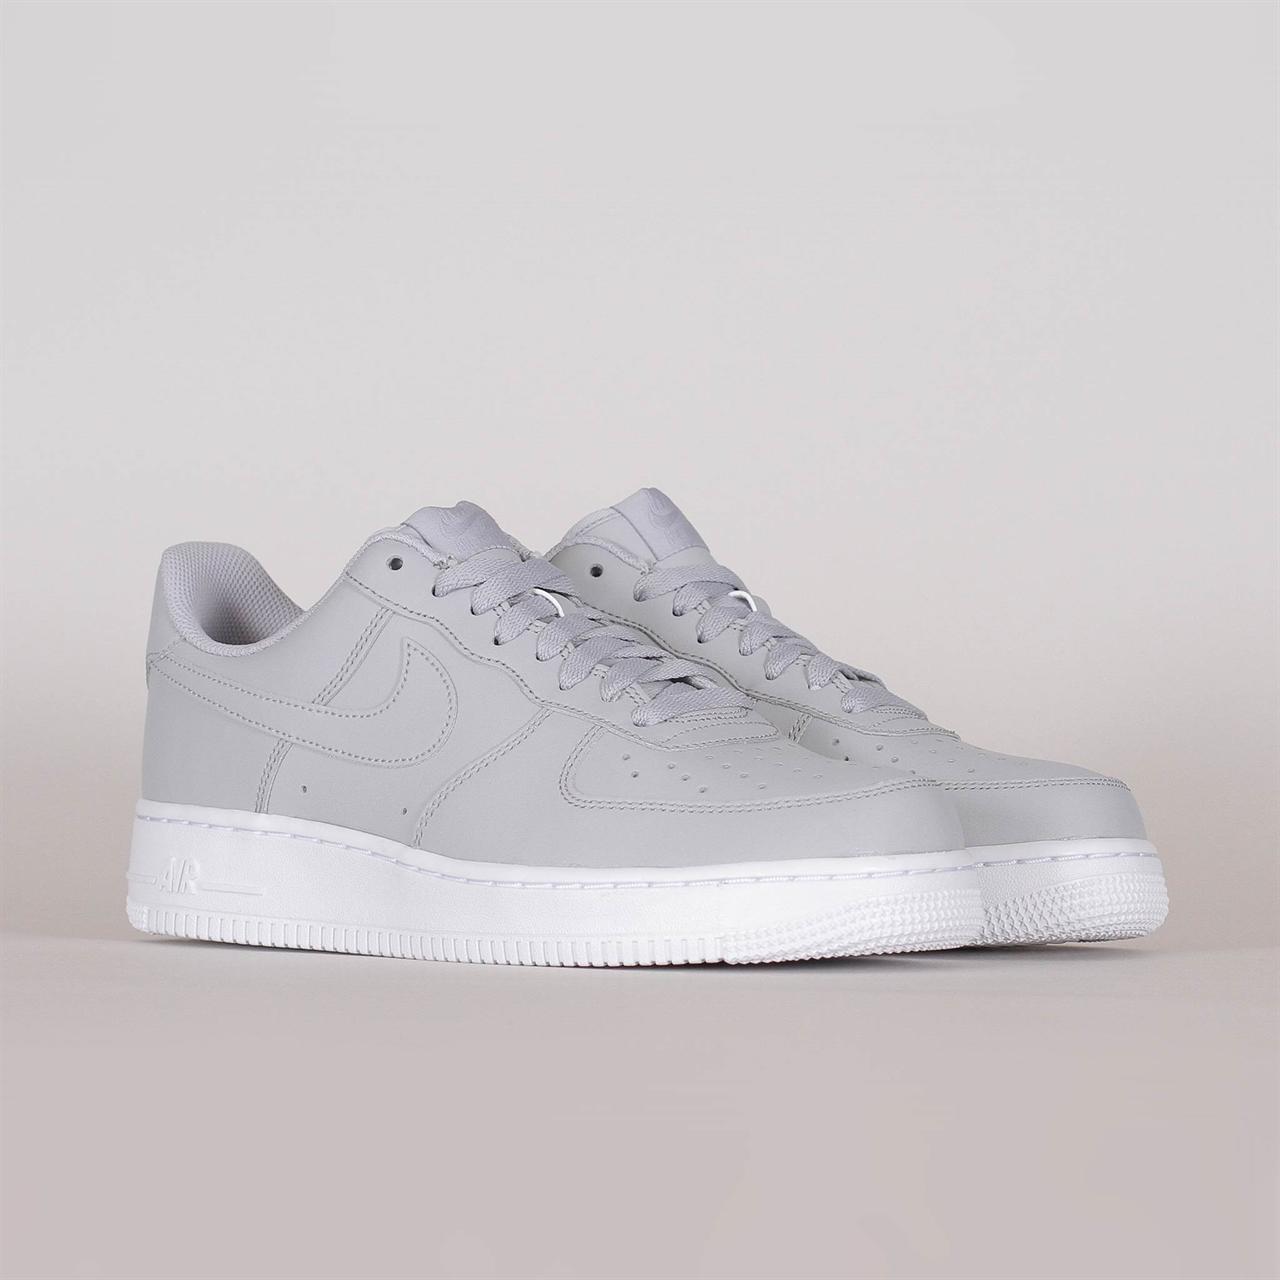 Shelta Nike Air Force 1 07 Wolf Grey (AA4083 010)